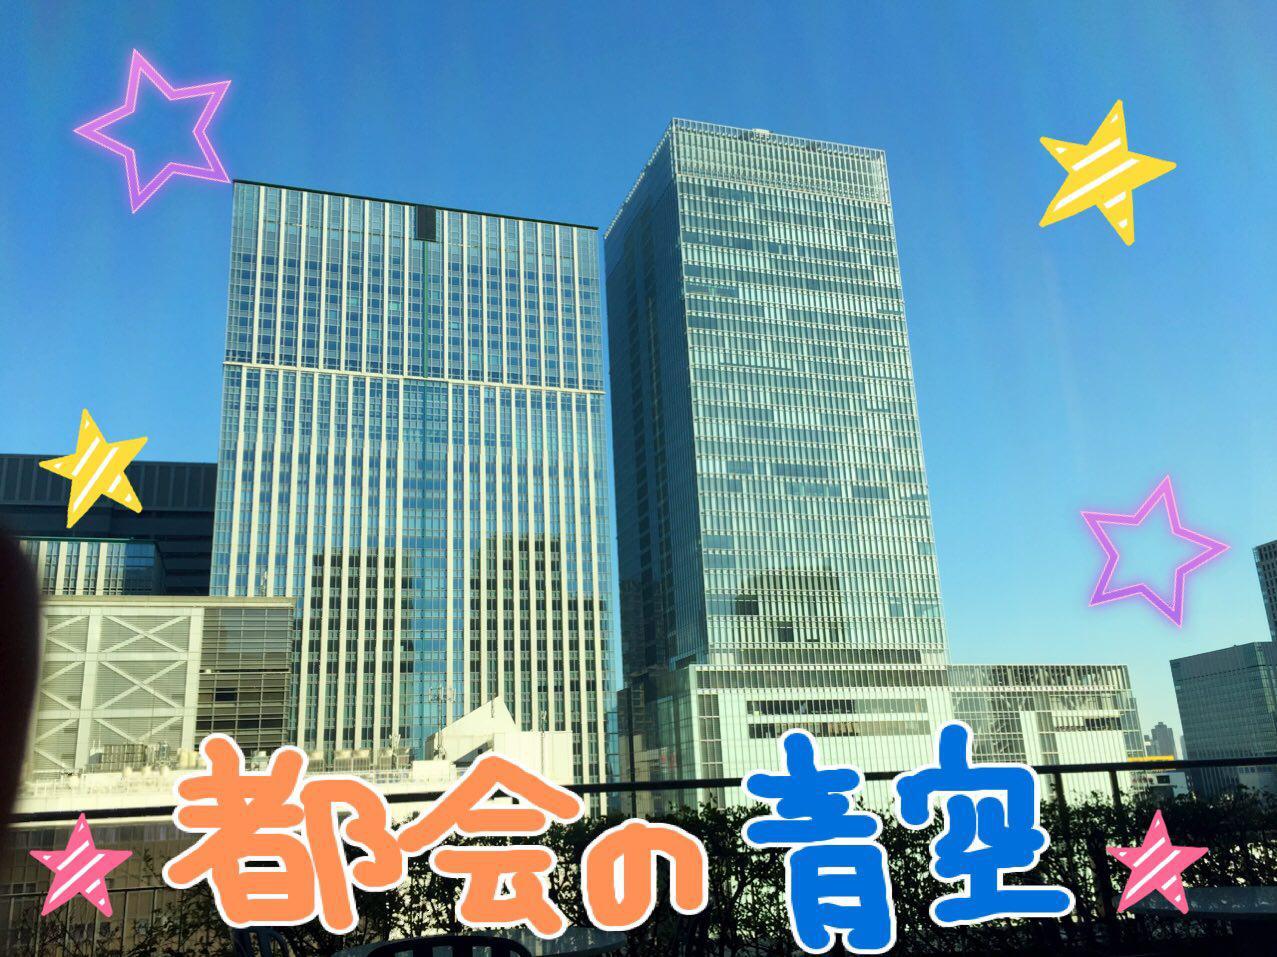 photo_2017-02-15_23-49-39.jpg